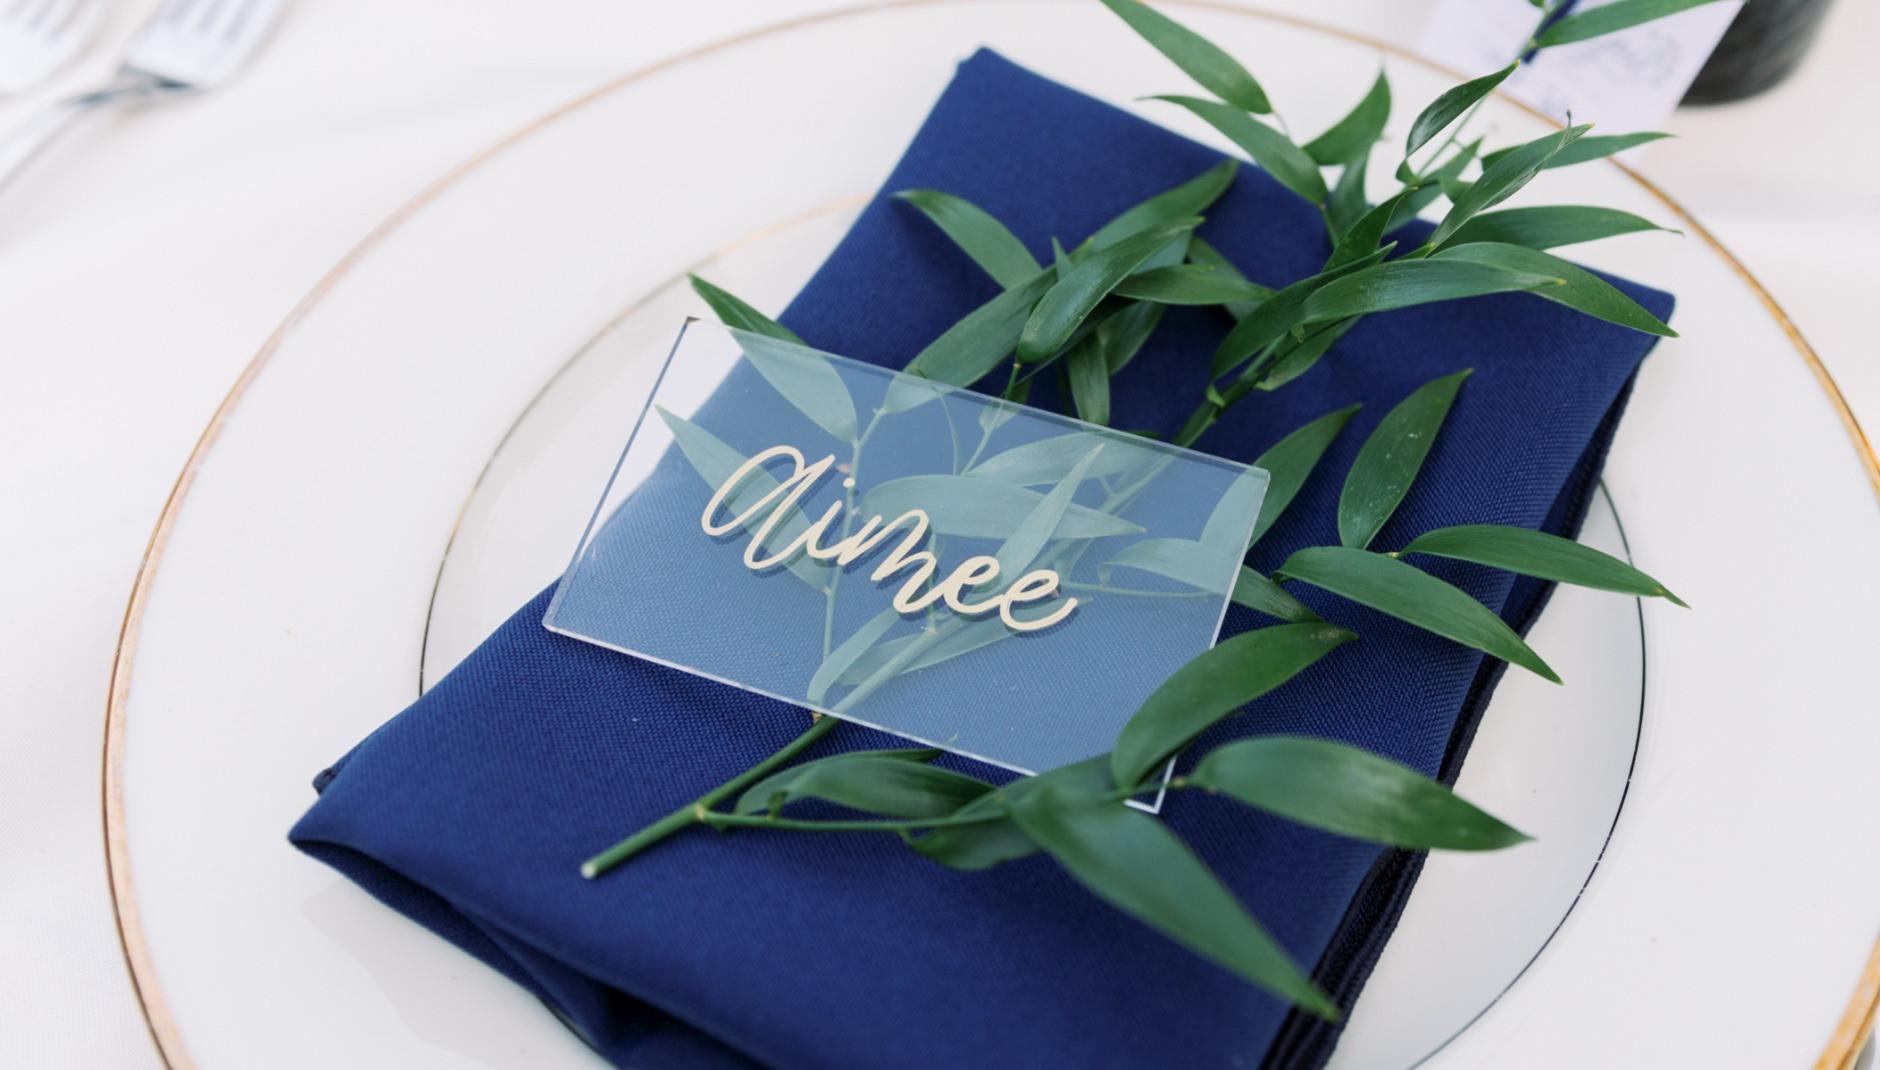 Acrylic placecard for wedding reception